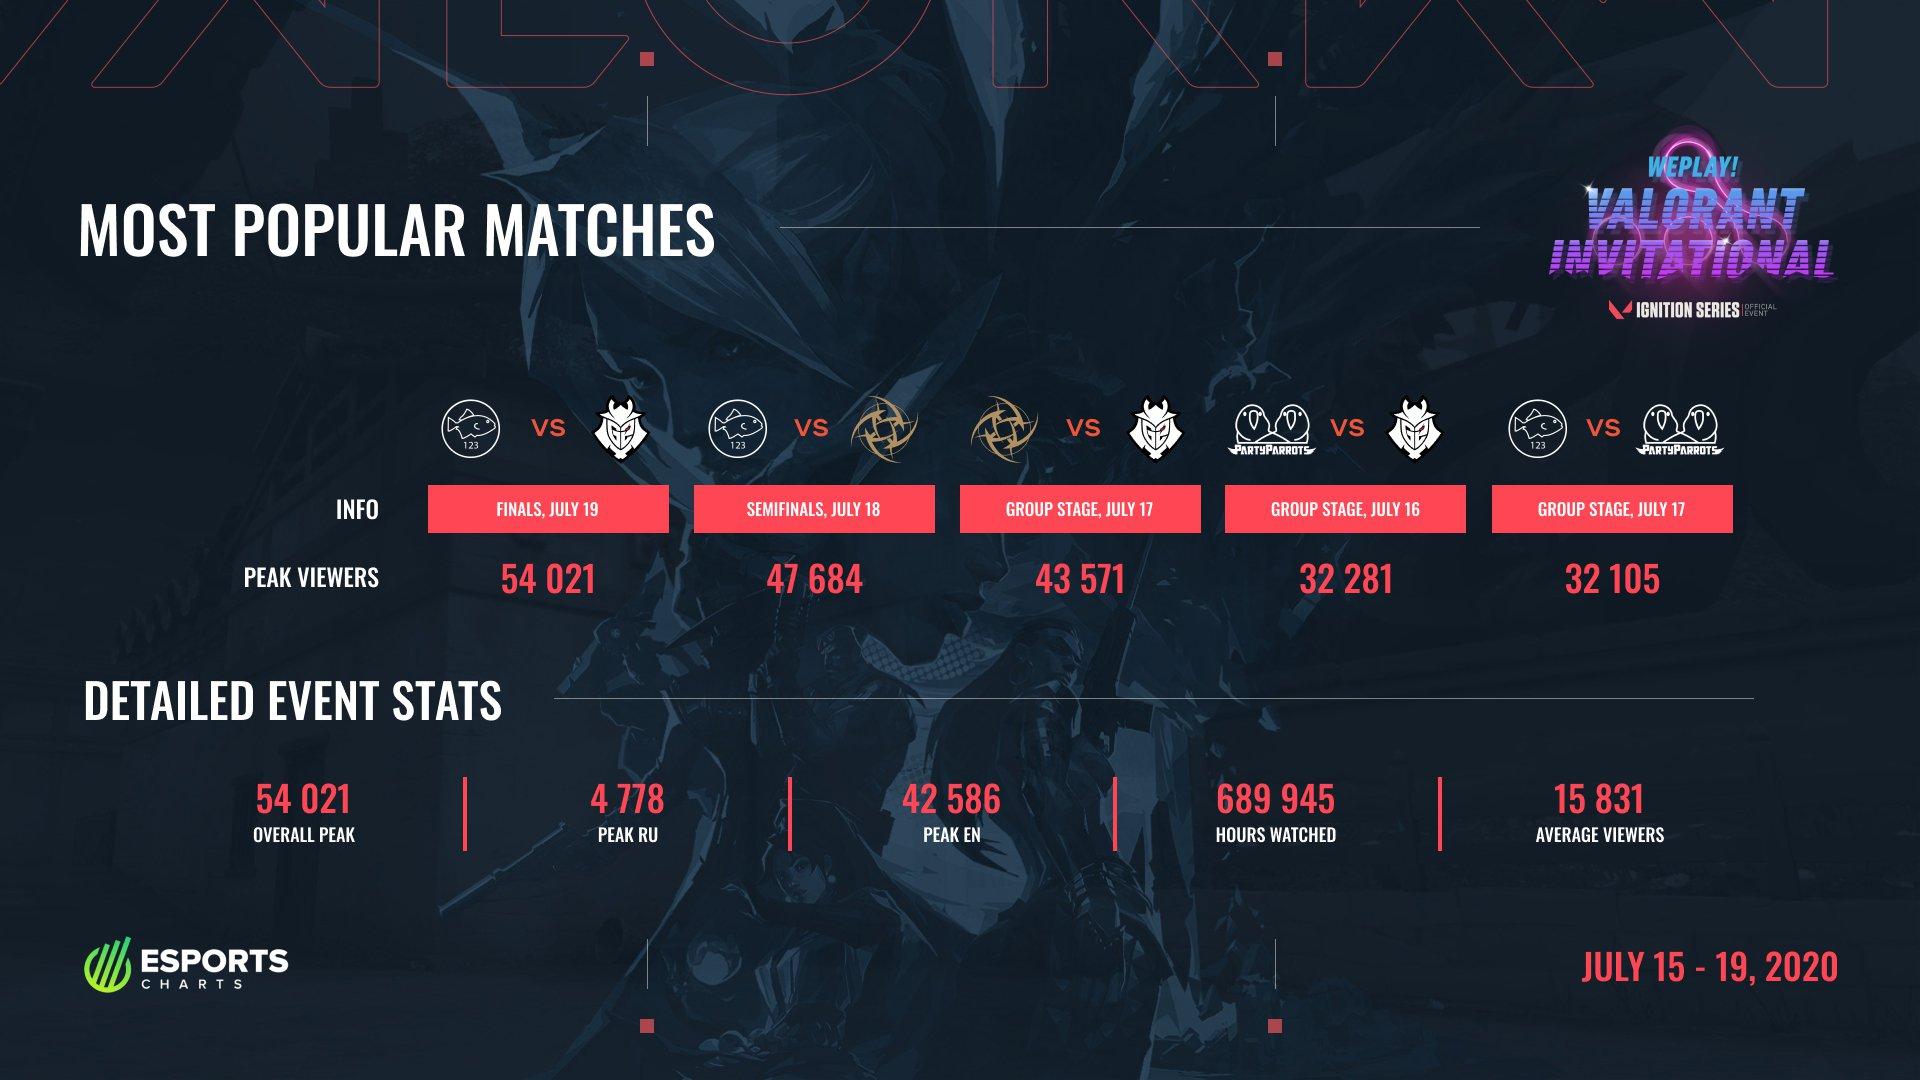 The WePlay! VALORANT Invitational tournament statistics by Esports Charts